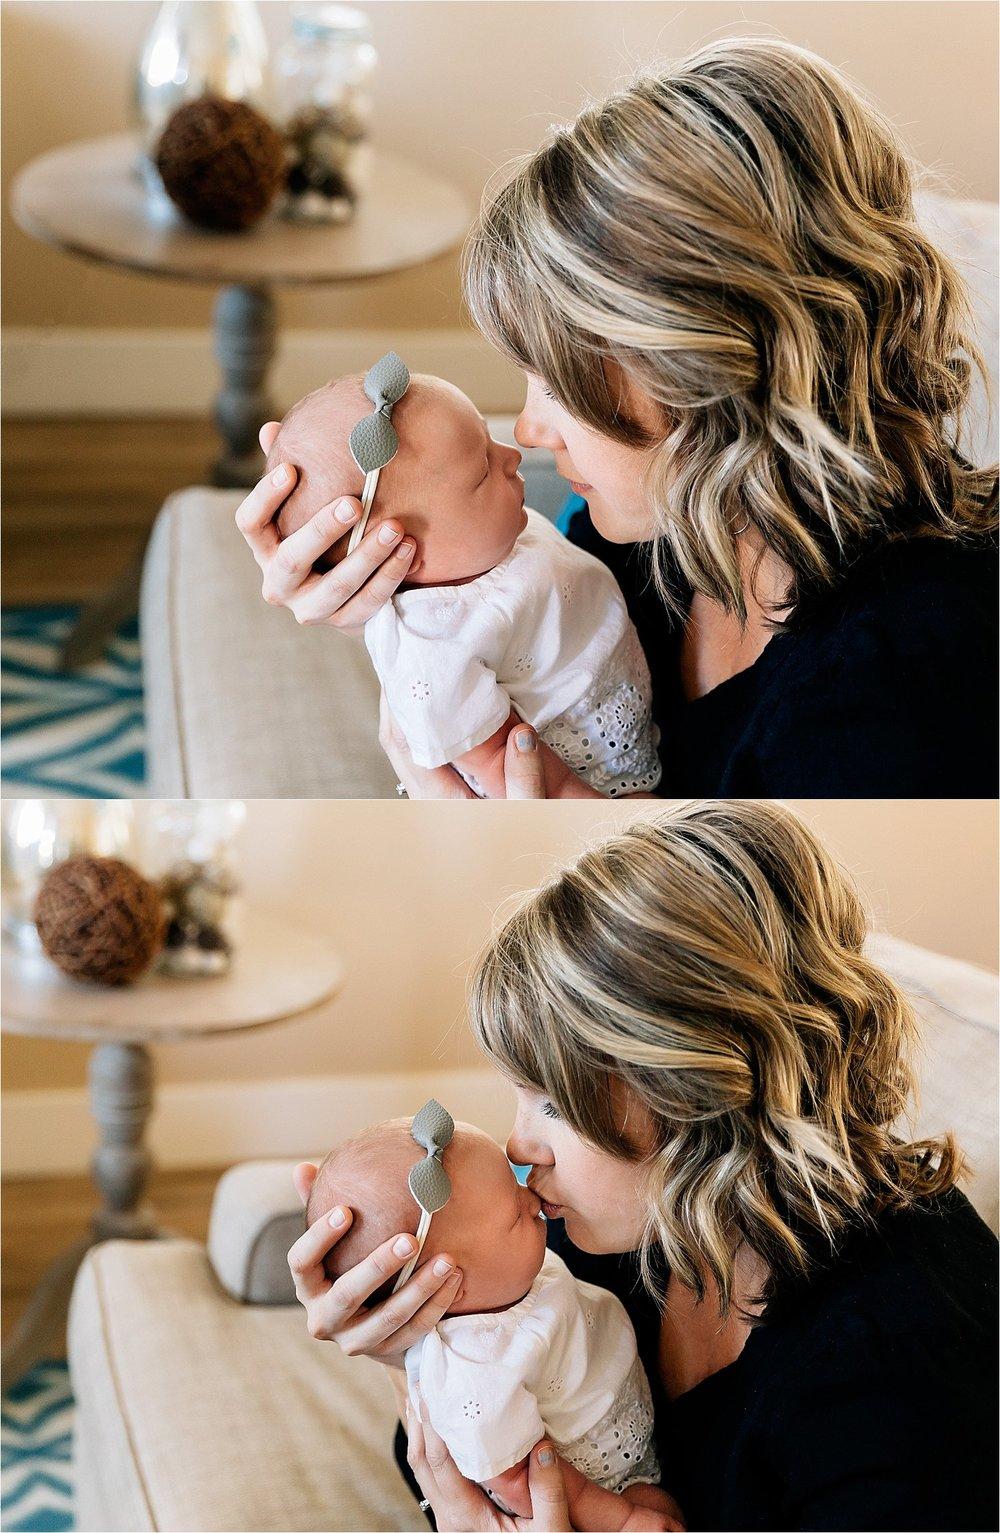 mom-newborn-poses.jpg